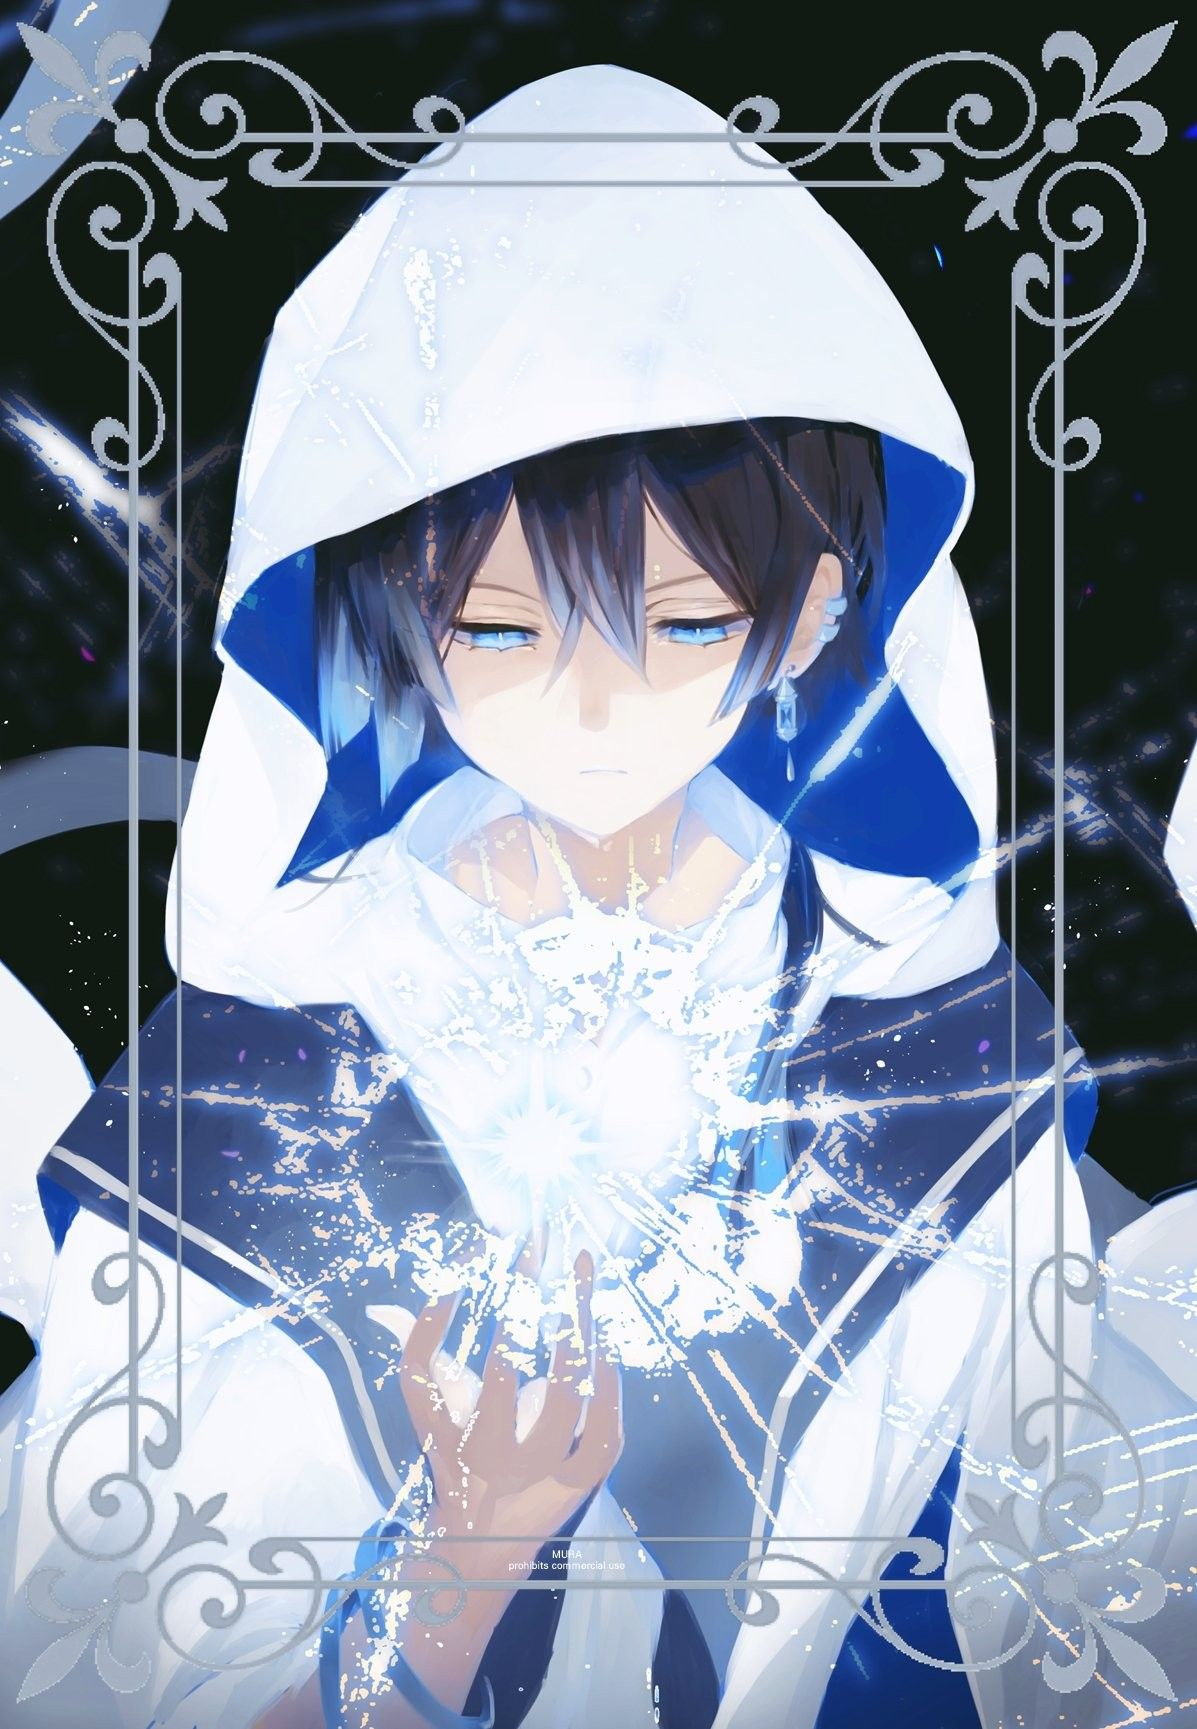 Pin By Dominika Flaisz On Case Study Of Vanitas Evil Anime Anime Drawings Boy Anime Artwork